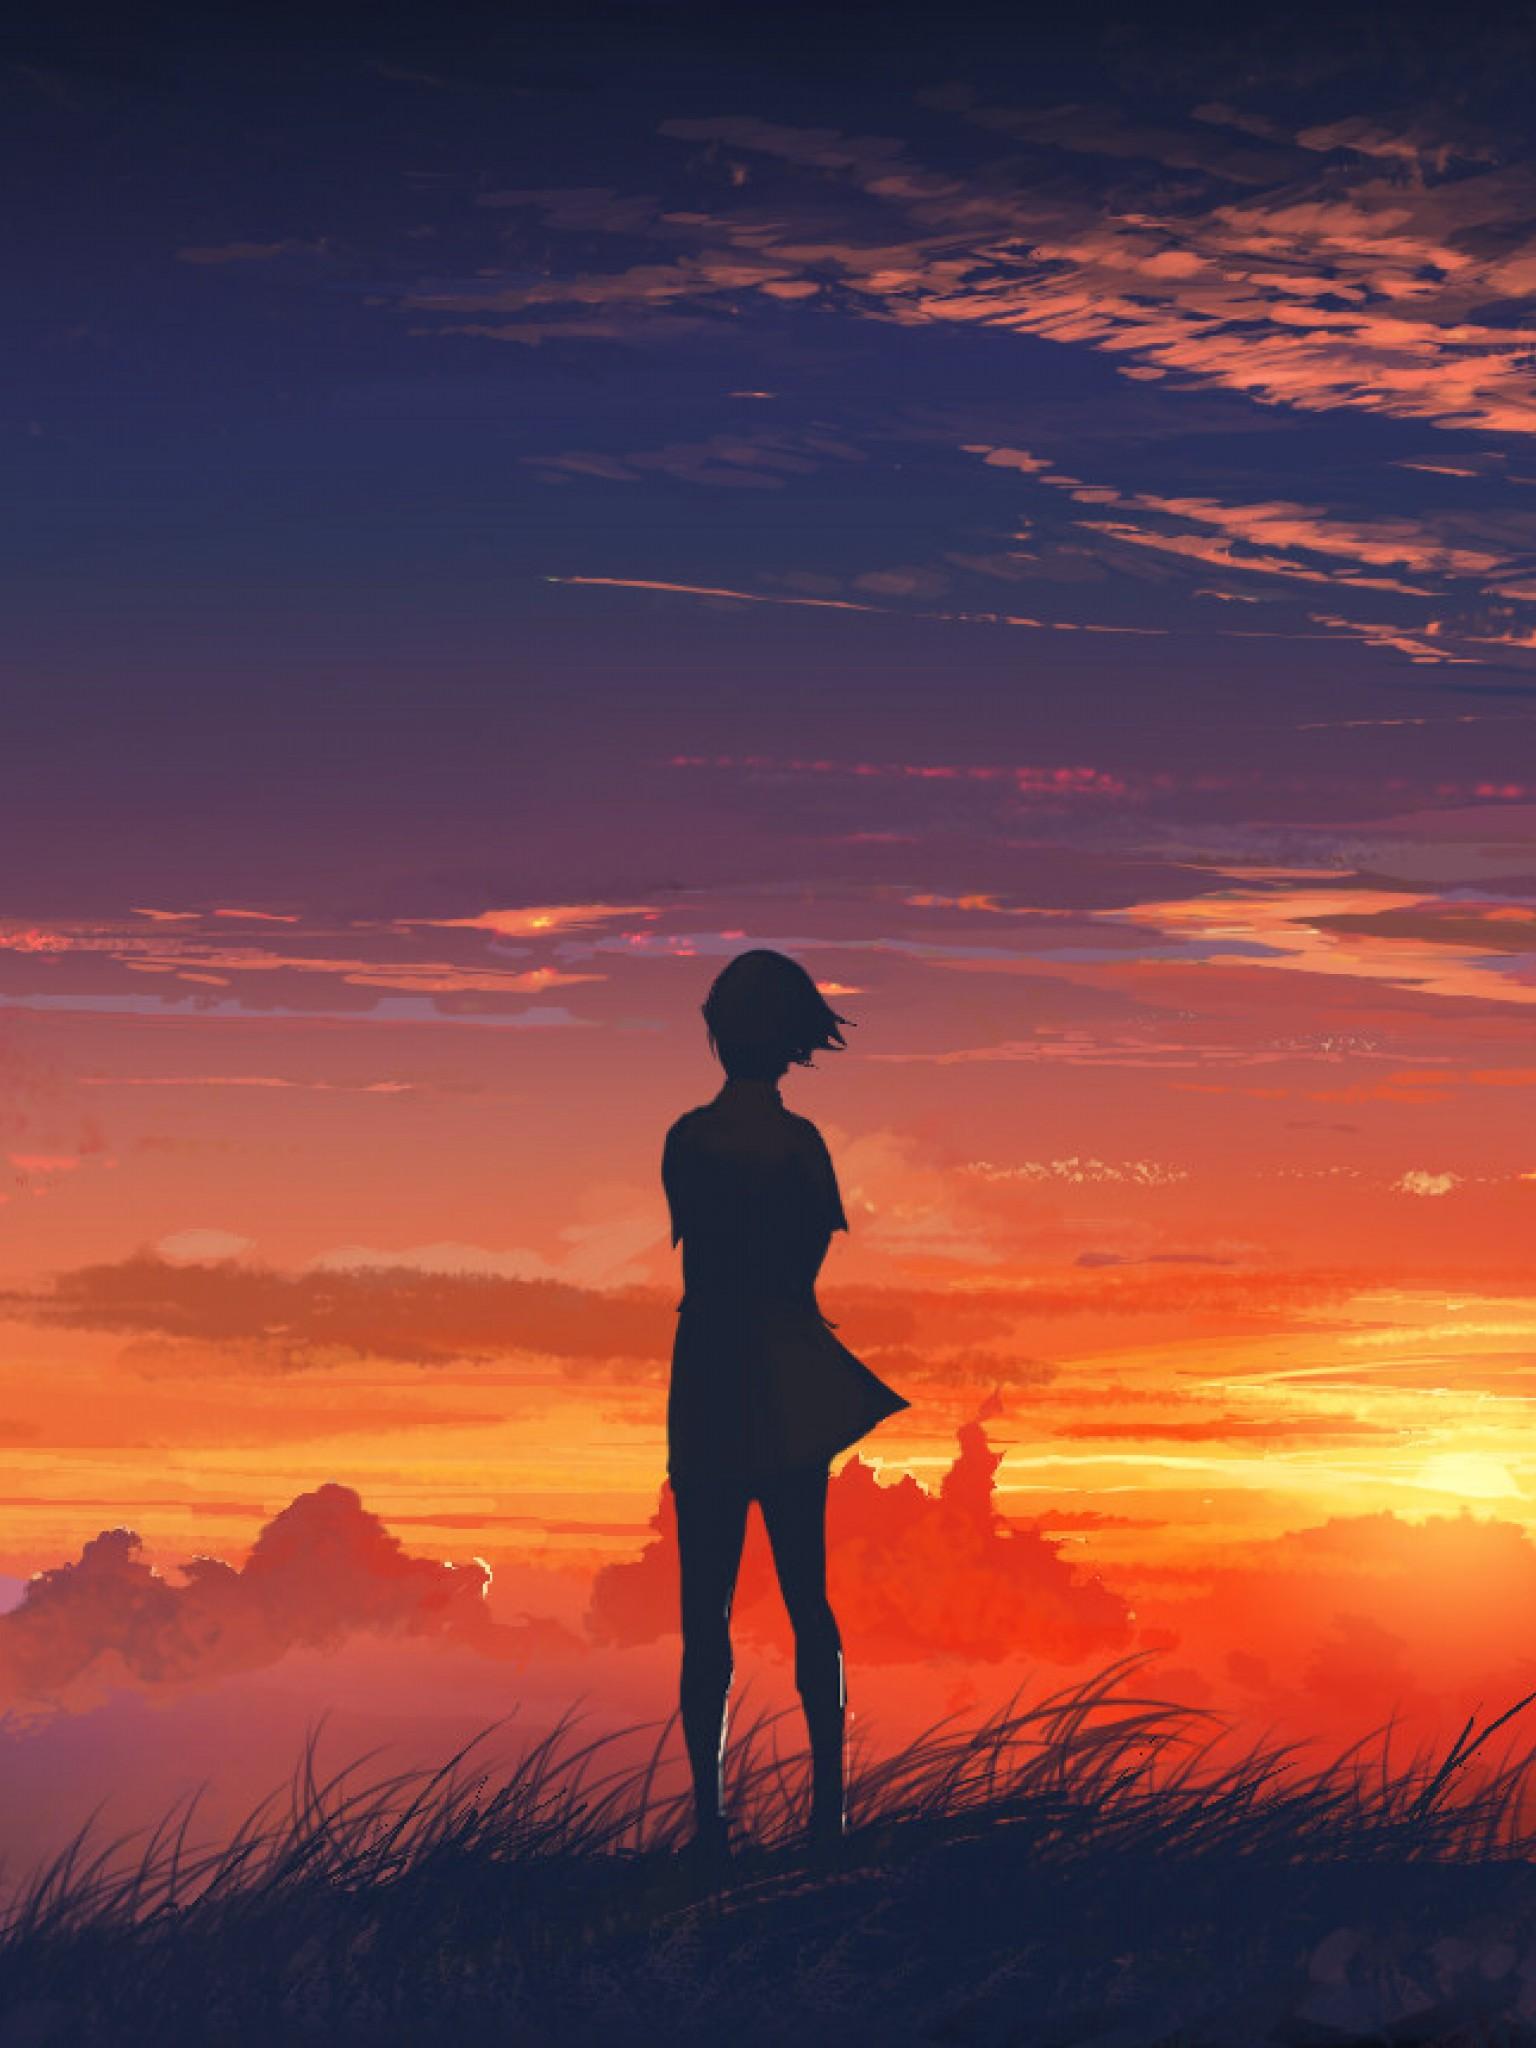 Sunset anime girl HD Wallpaper Retina iPad - HD Wallpaper ...